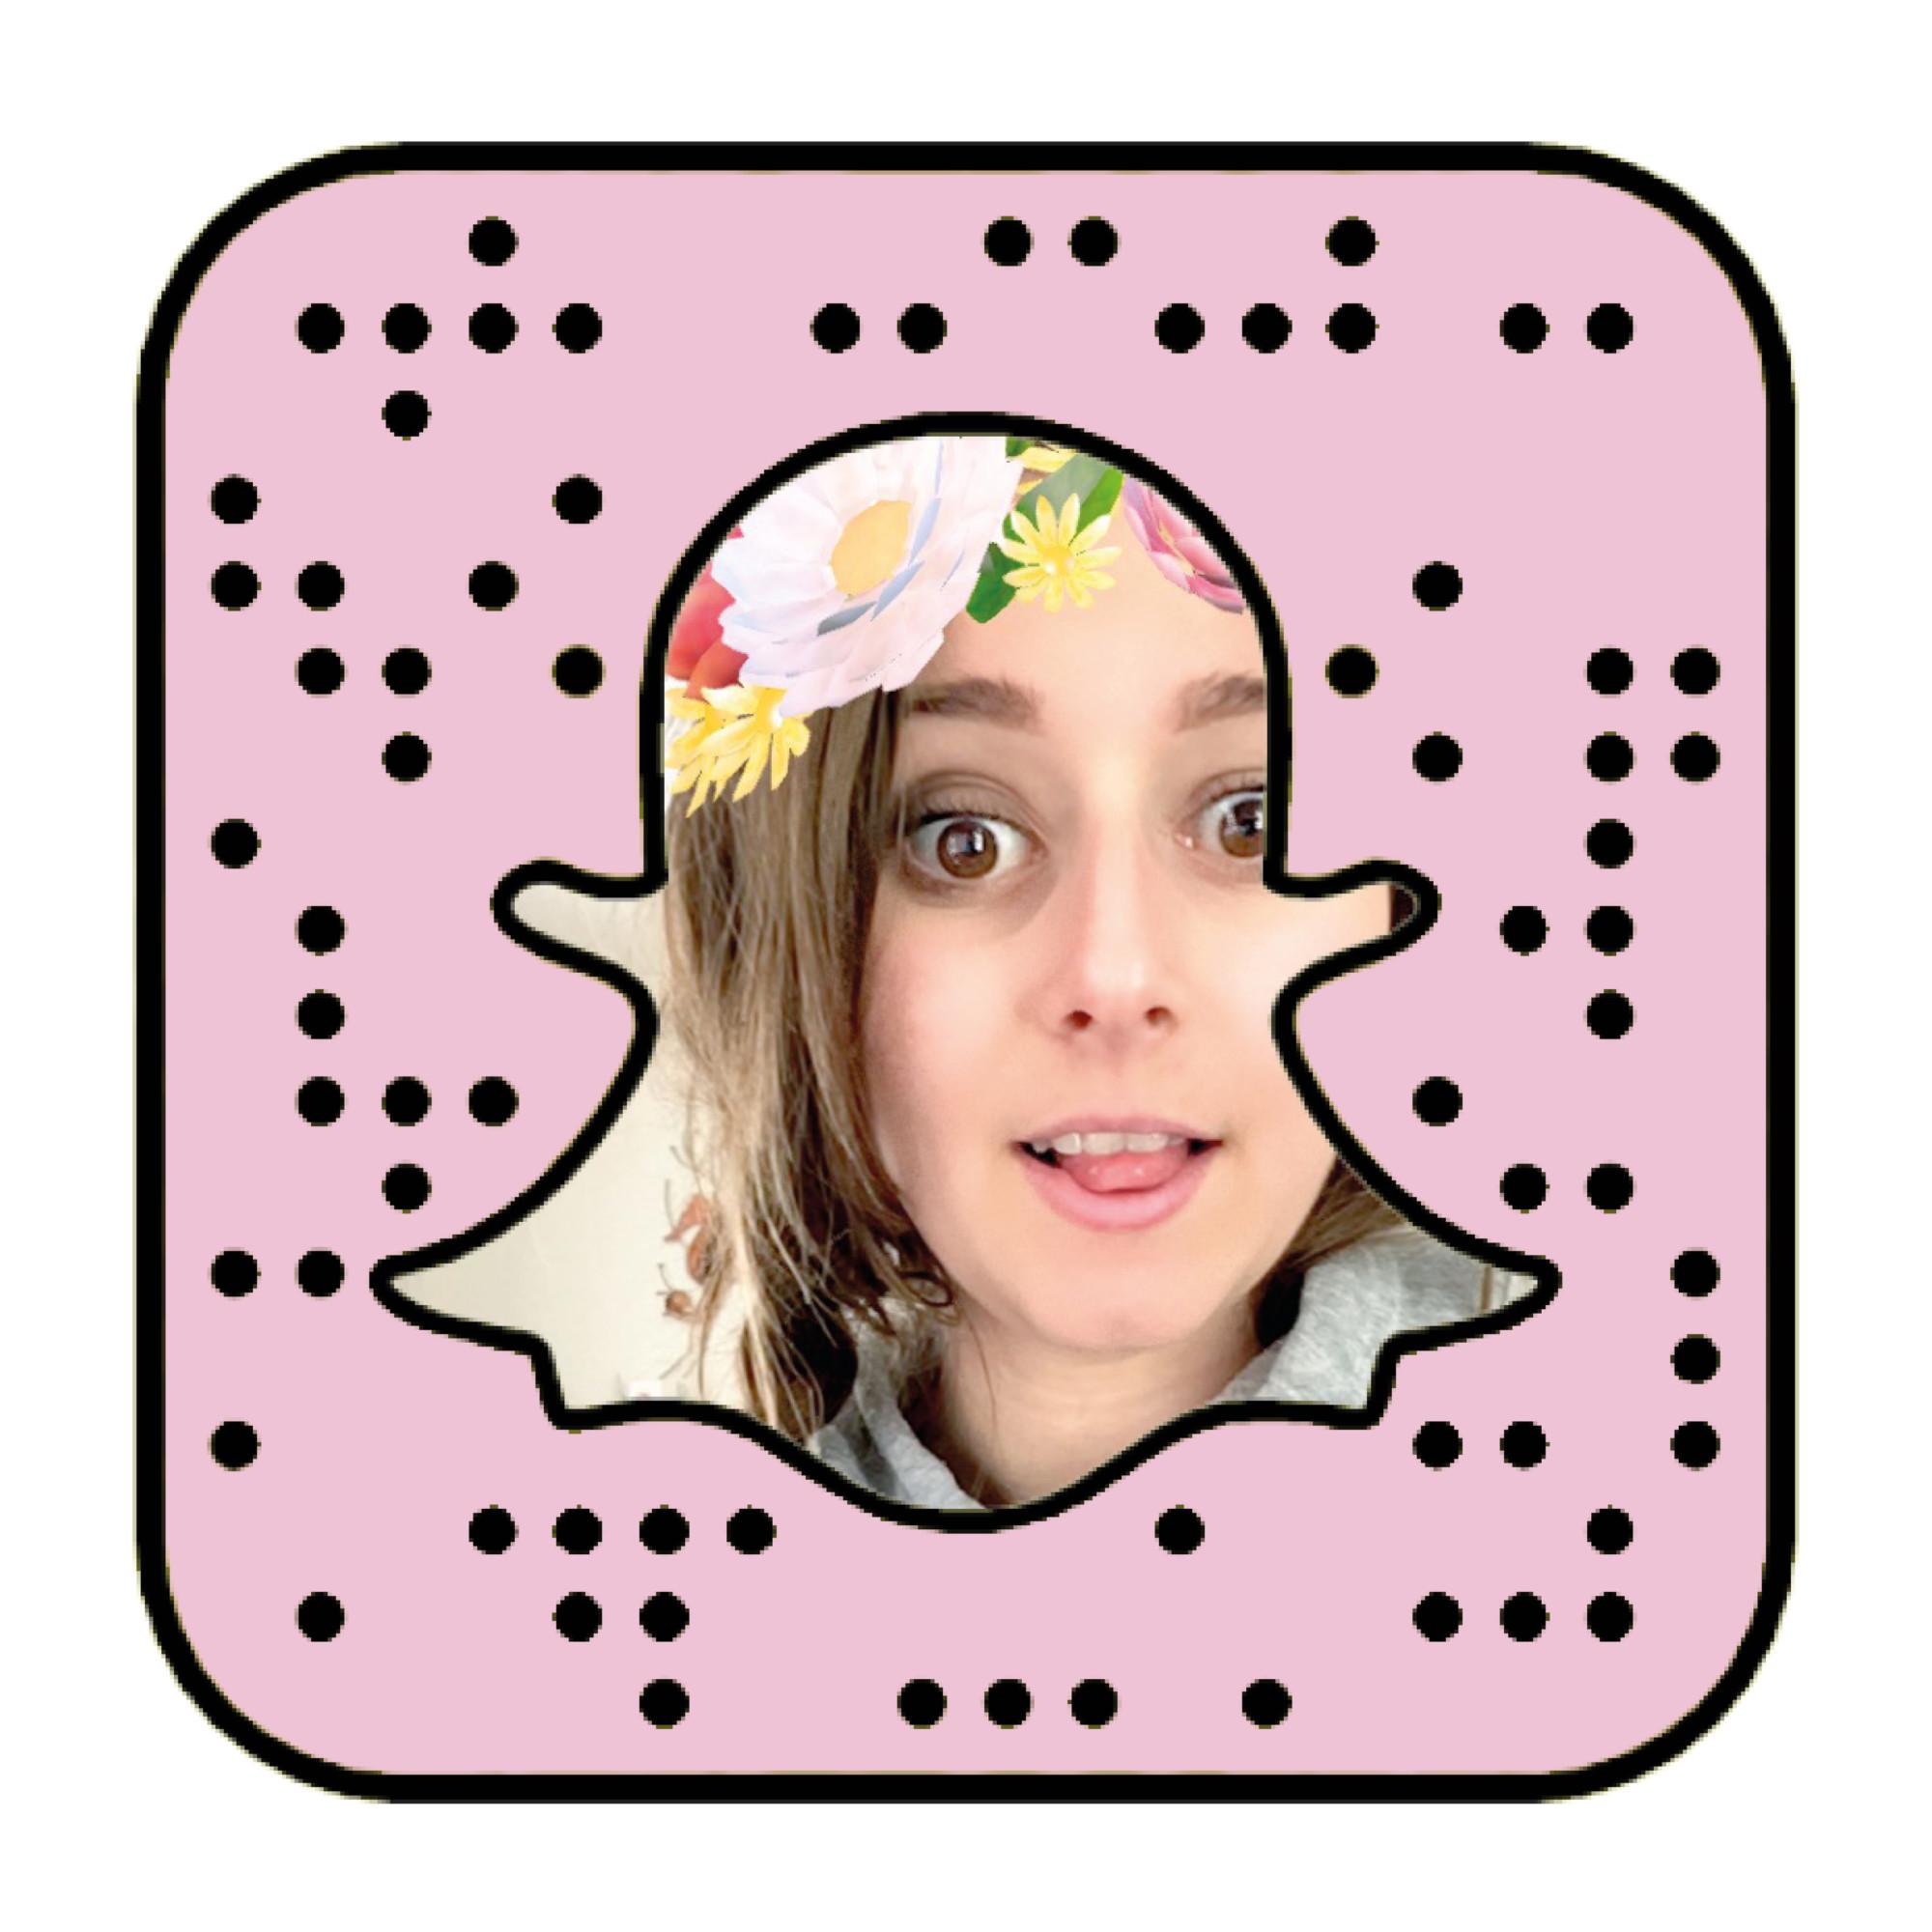 Rejoins-moi sur Snapchat !